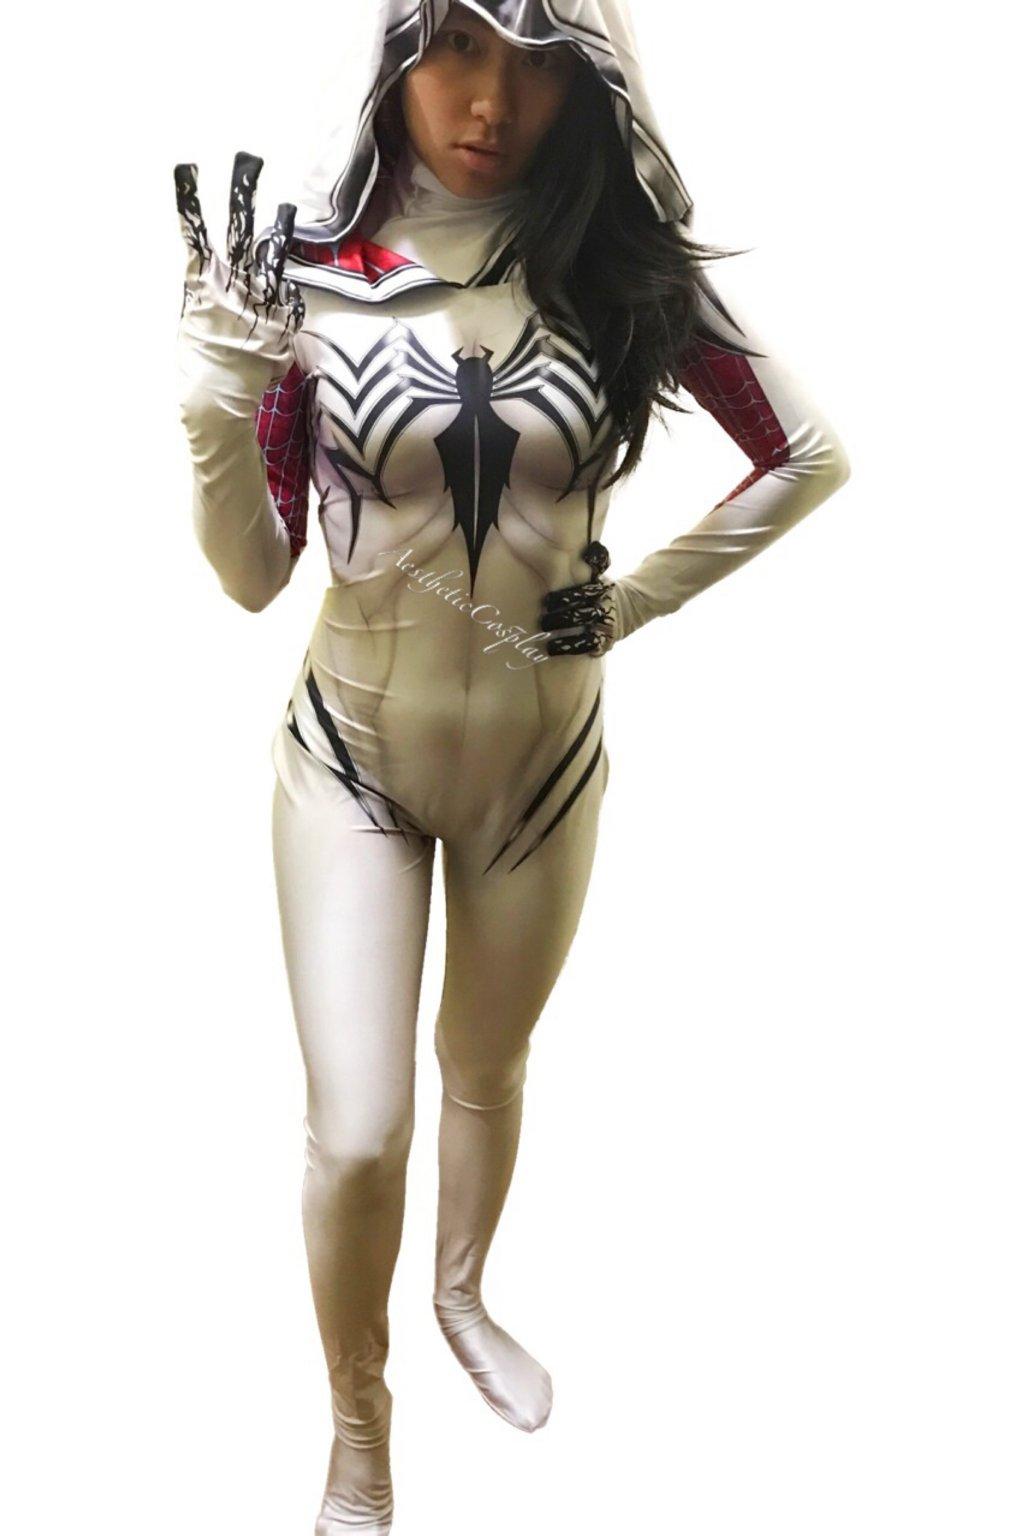 AestheticCosplay Gwenom Cosplay Costume   AntiGwenom Red Carnage Gwen Stacy Suit Bodysuit   Lycra Fabric 61NRBy67dfL